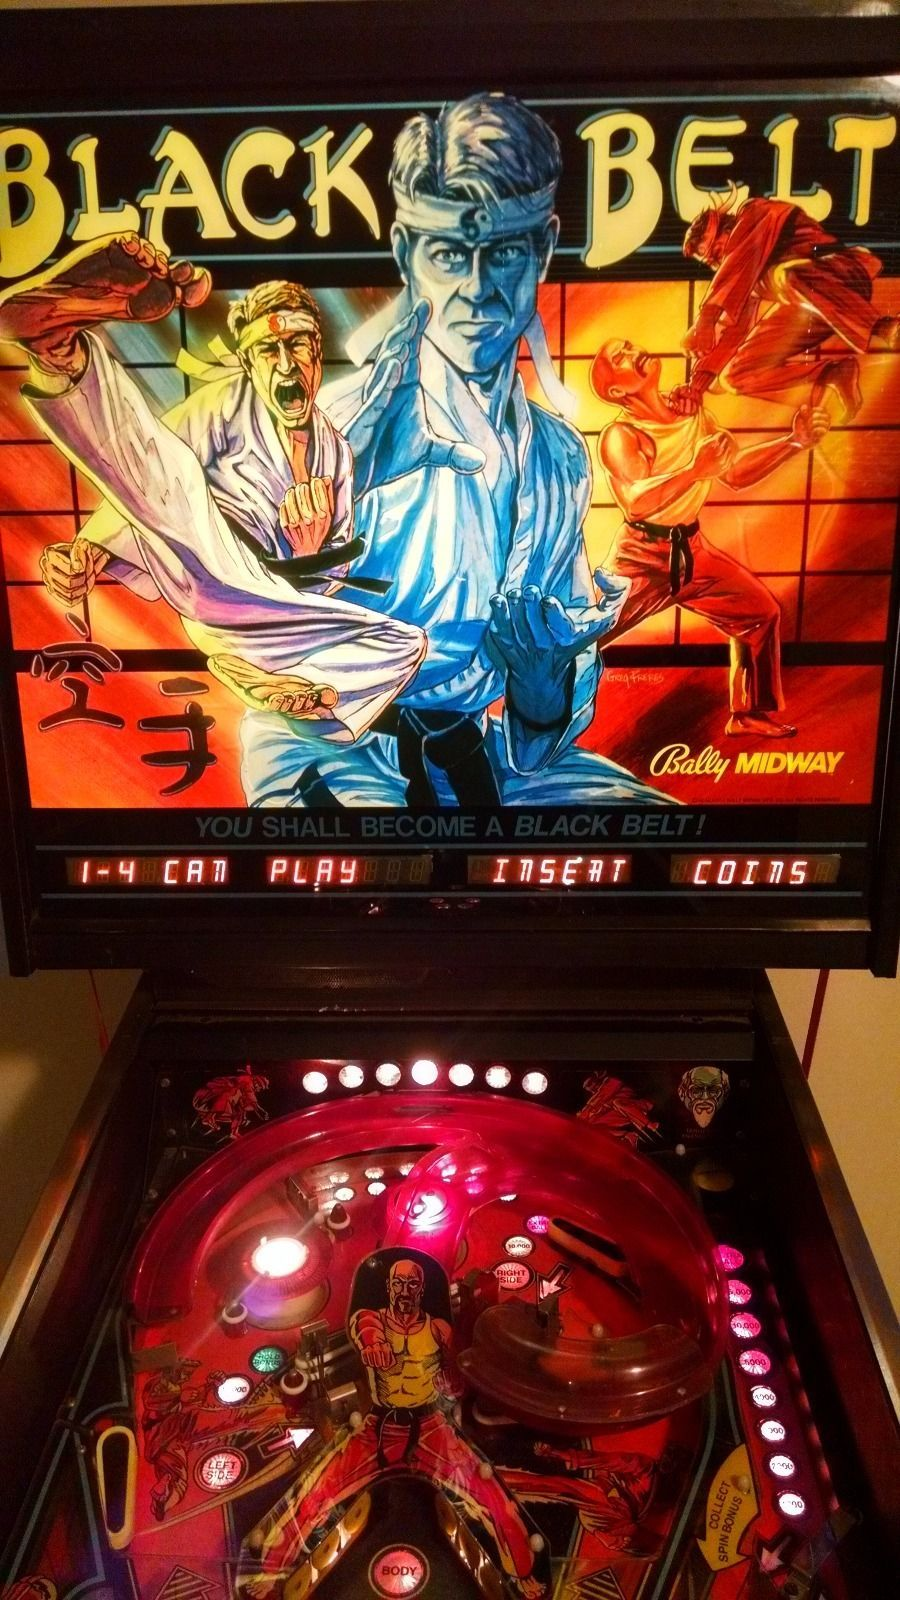 Bally Black Belt Pinball Picture Http Www Dialashop Com Pinball Bally Html Bally Pinball Machine Pinball Wizard Pinball Arcade